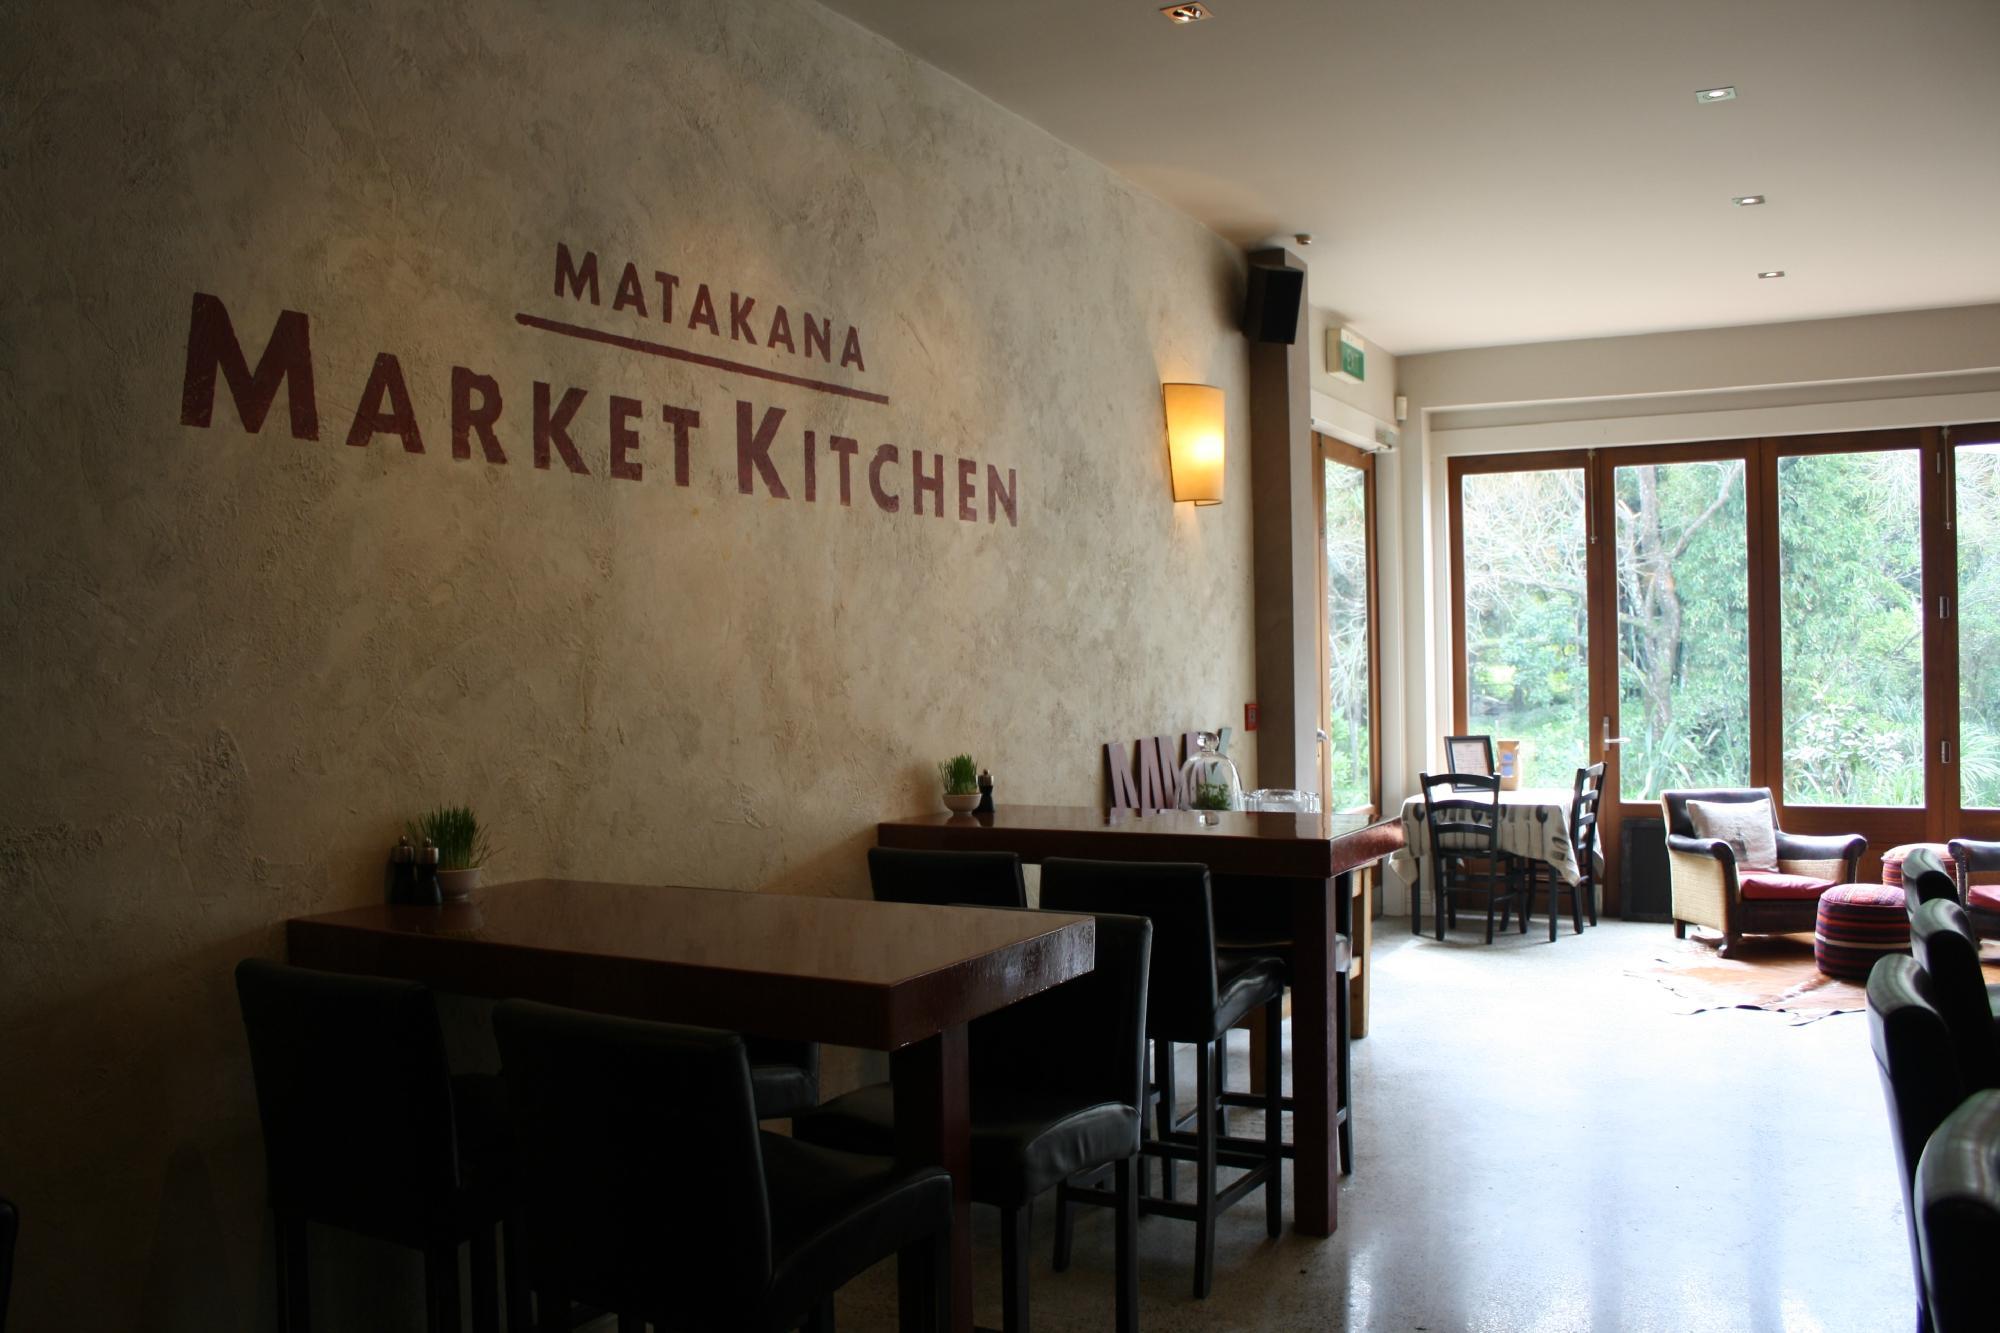 Matakana Market Kitchen